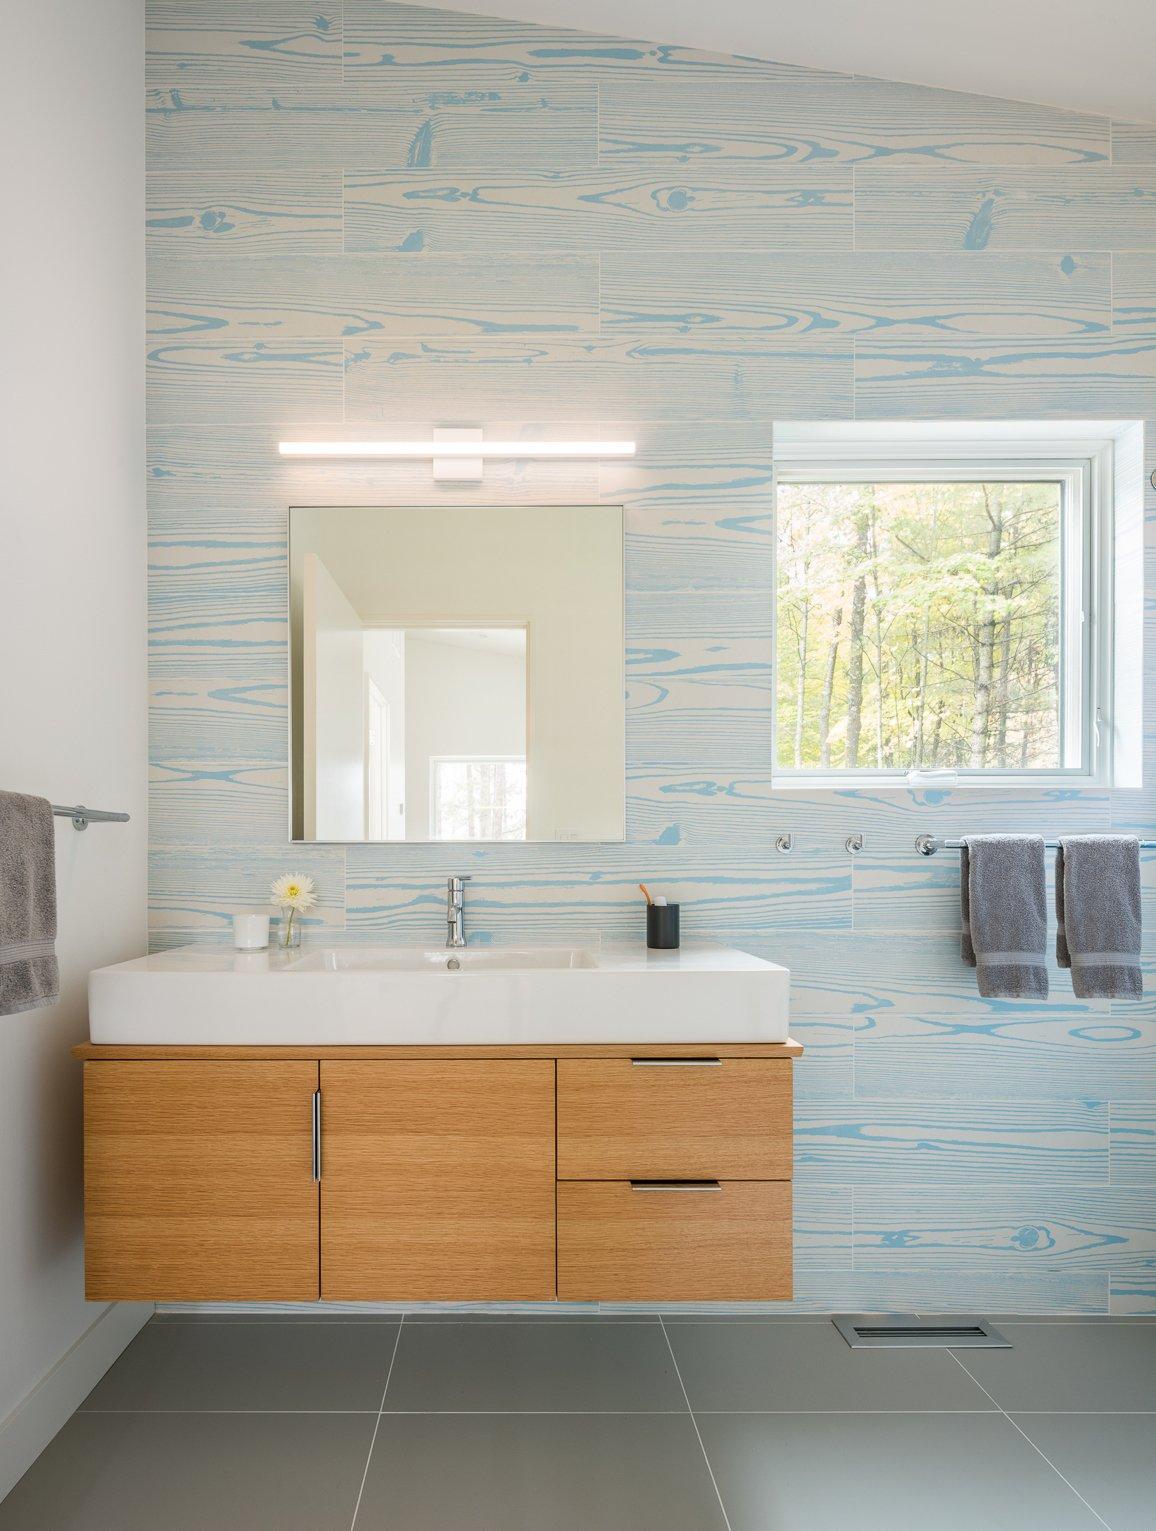 Bath Room, Ceramic Tile Floor, Wall Mount Sink, Ceiling Lighting, Wall Lighting, and Ceramic Tile Wall  Northern Lake Home by Strand Design